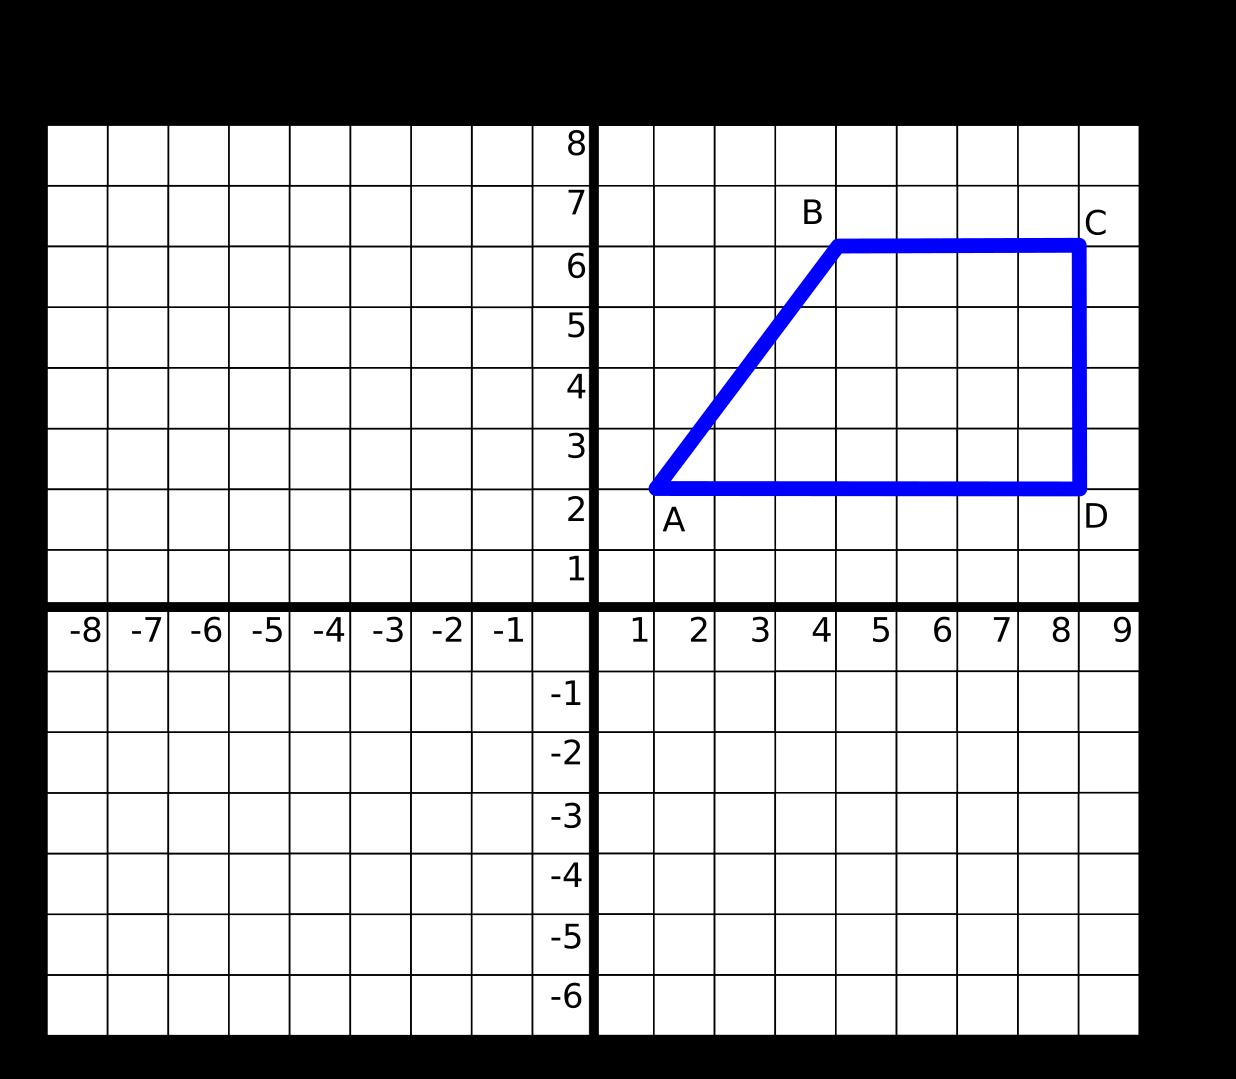 Soal Matematika Kelas 6 Sd Belahan Sistem Koordinat Dan ...